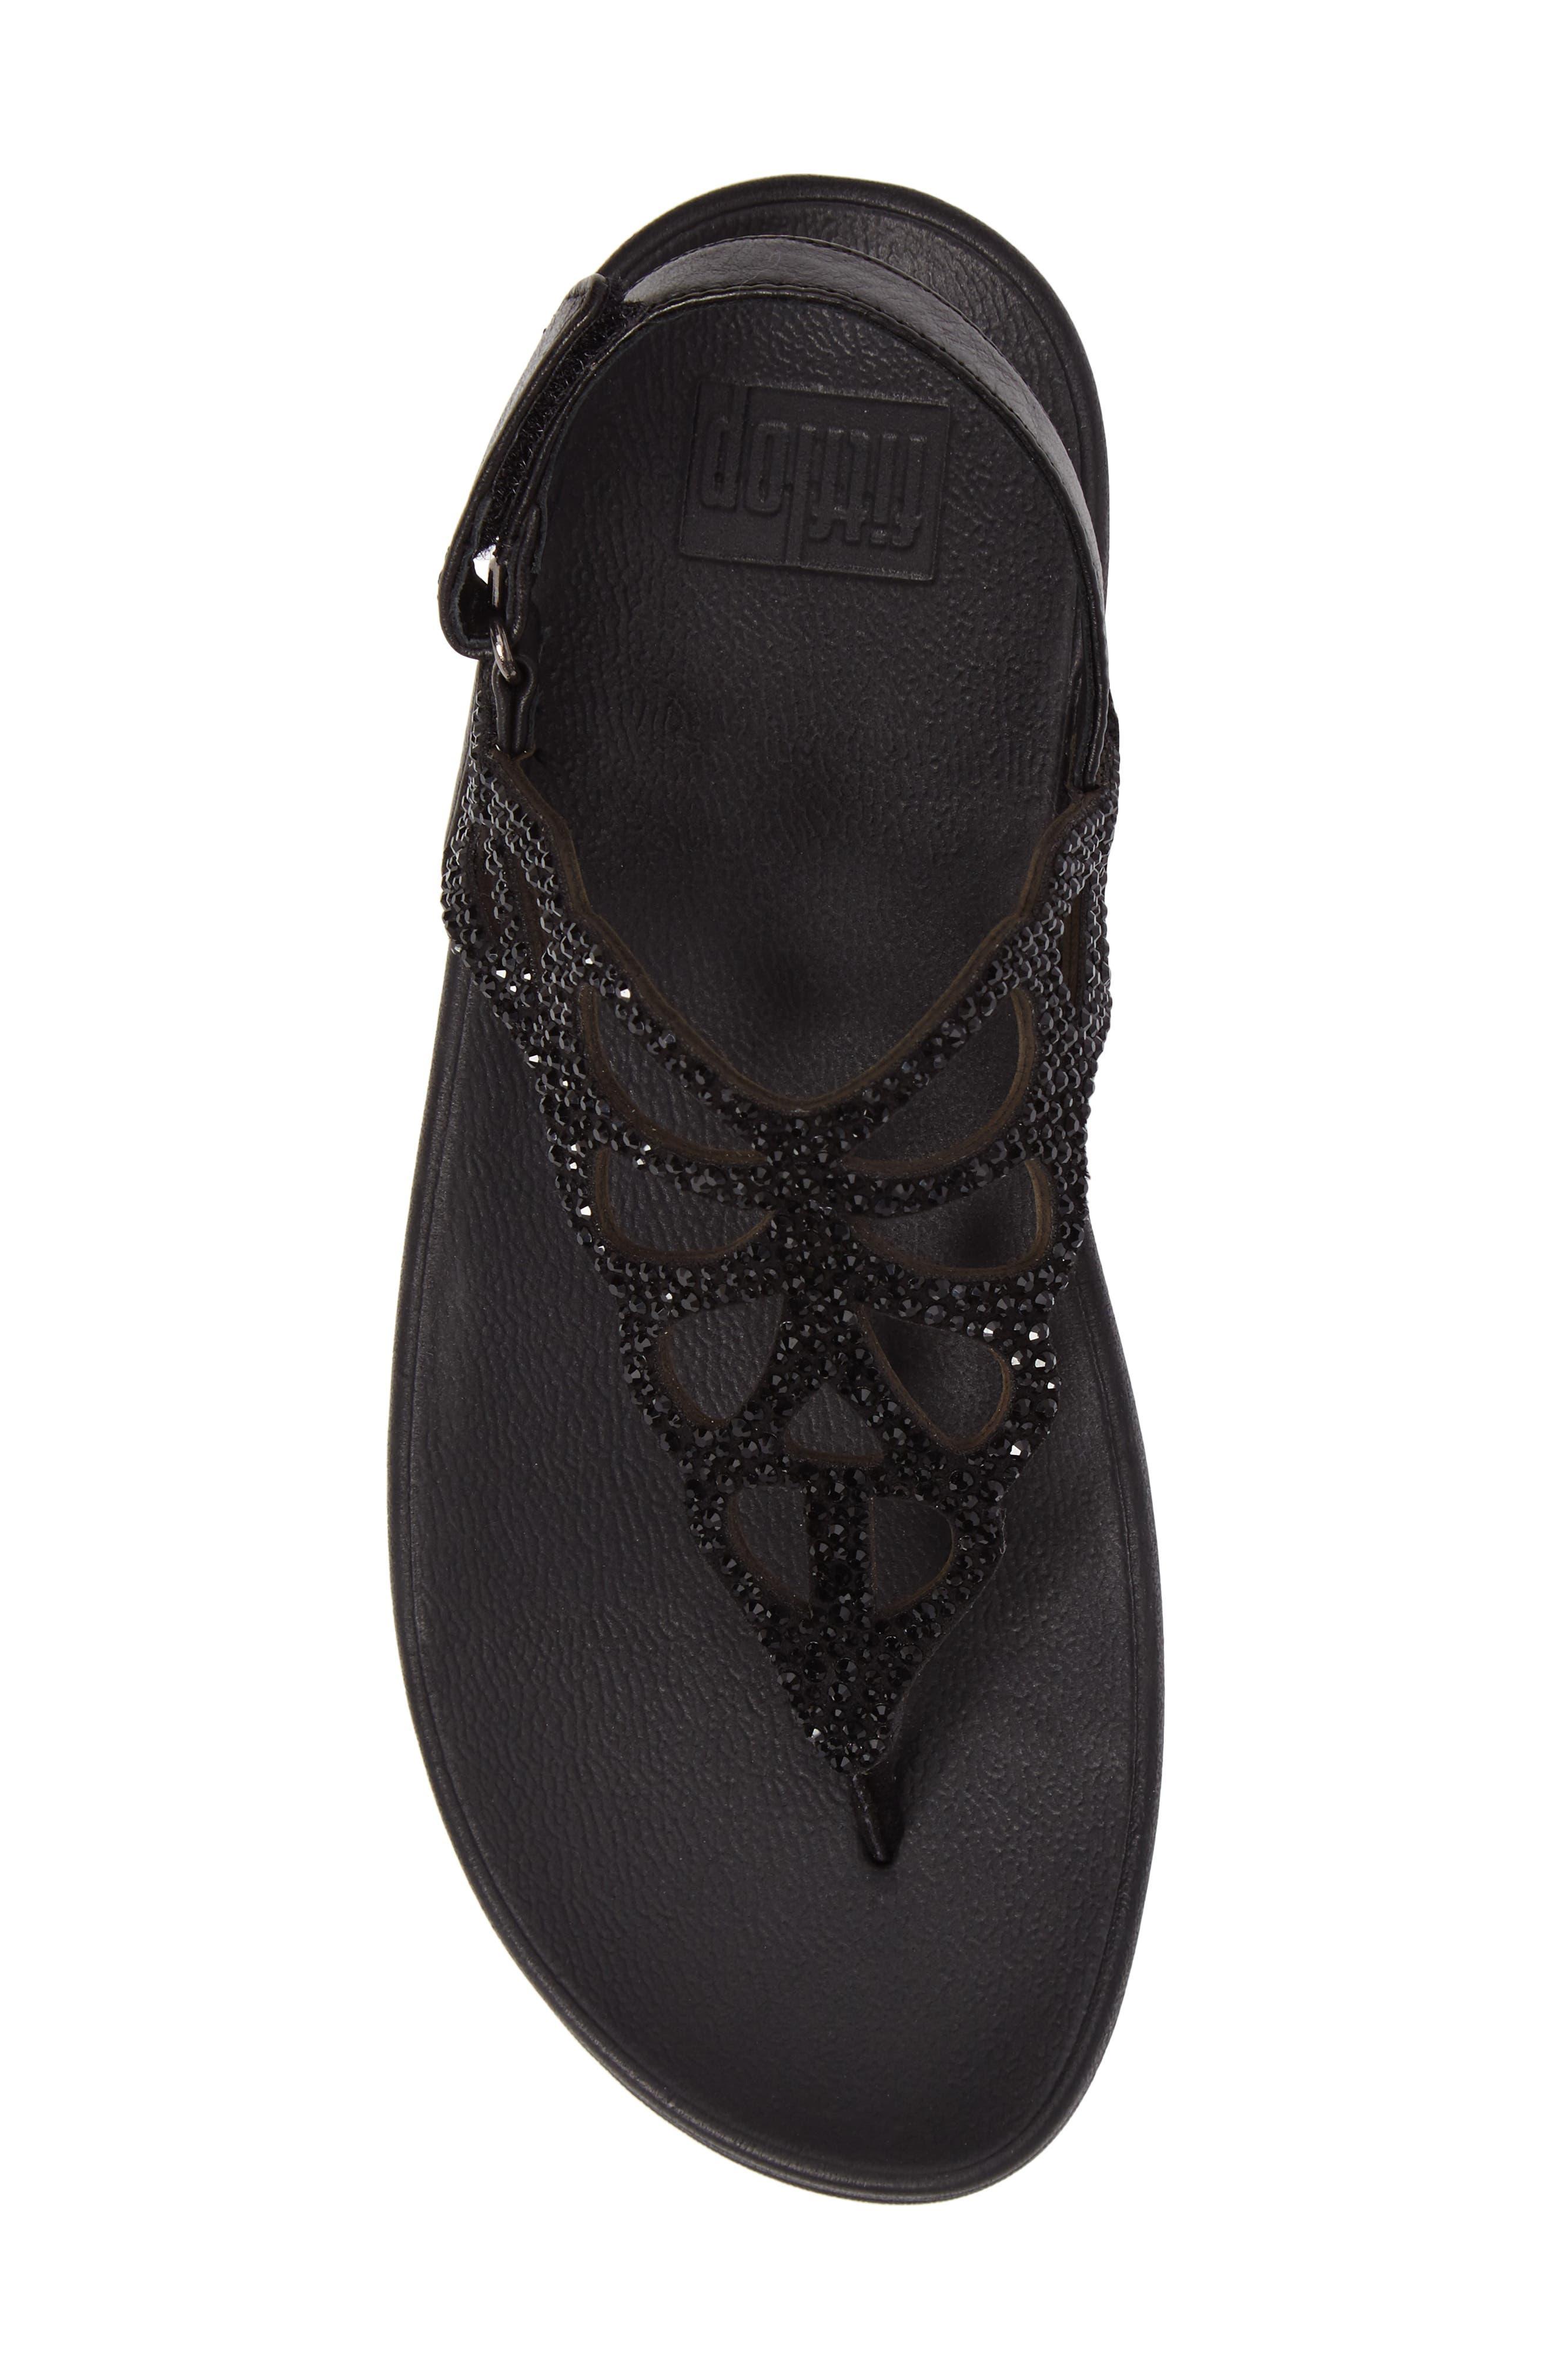 Bumble Crystal Embellished Sandal,                             Alternate thumbnail 5, color,                             Black Leather